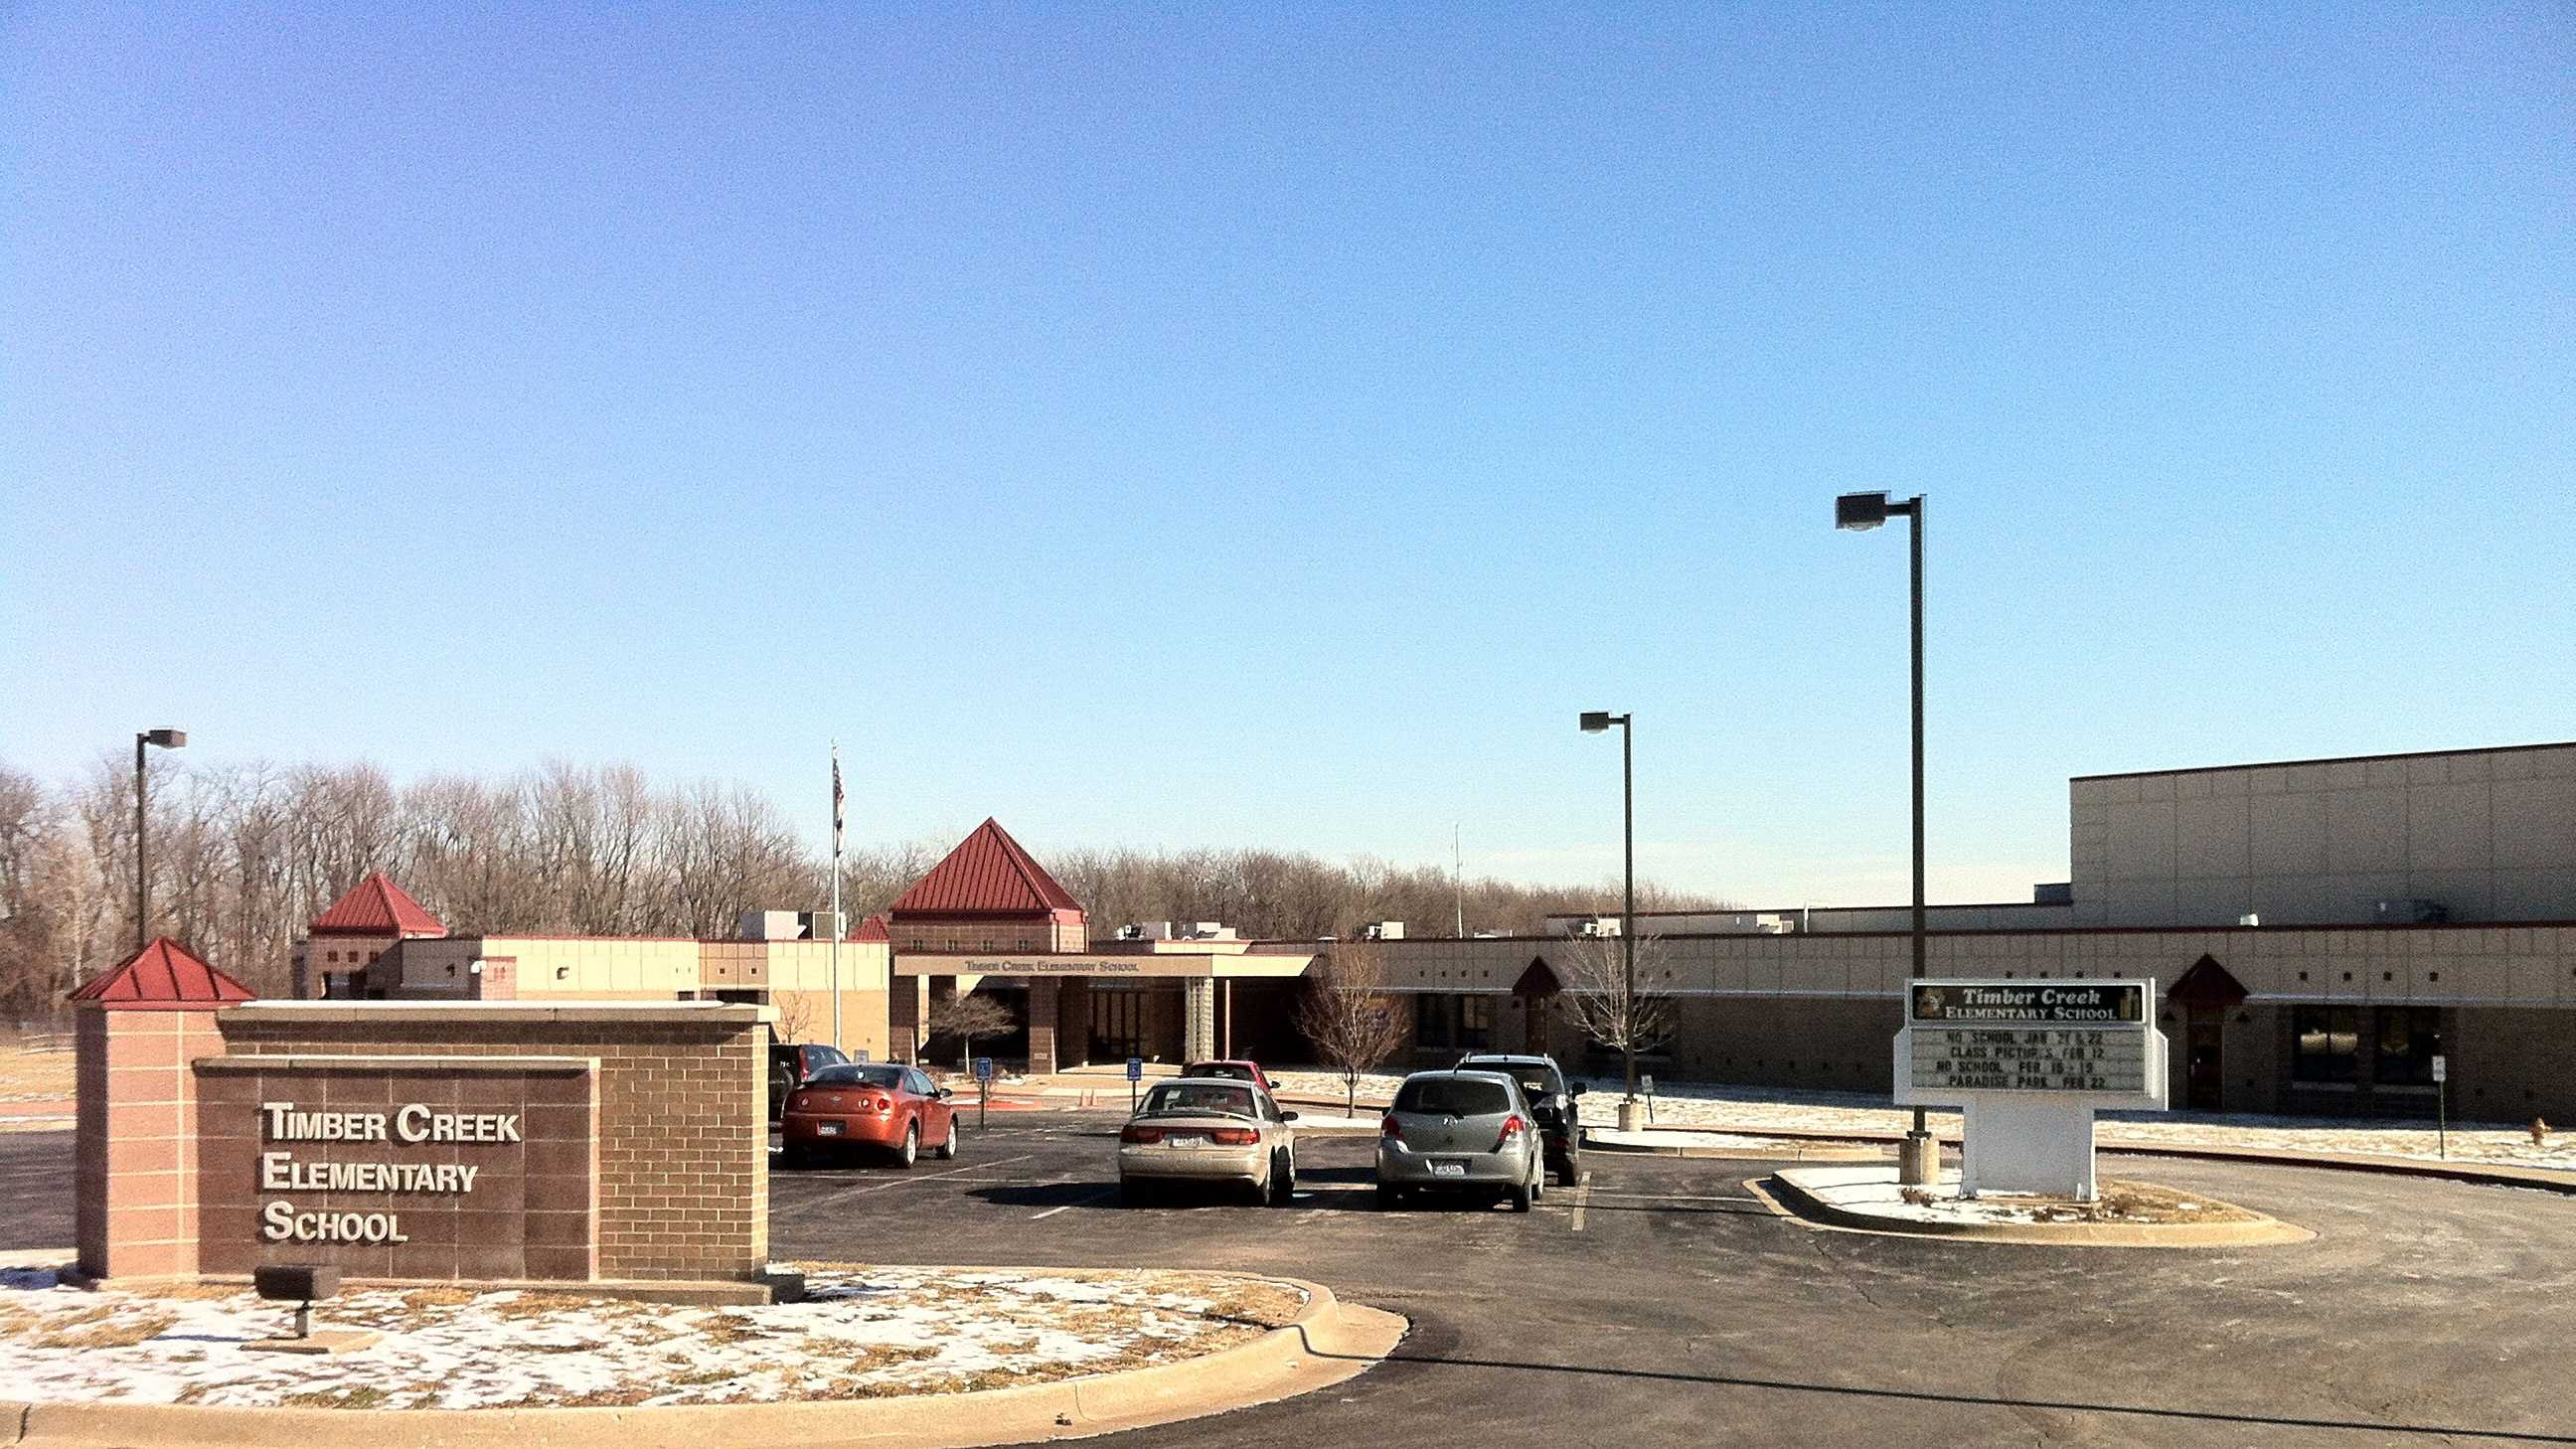 Timber Creek Elementary School